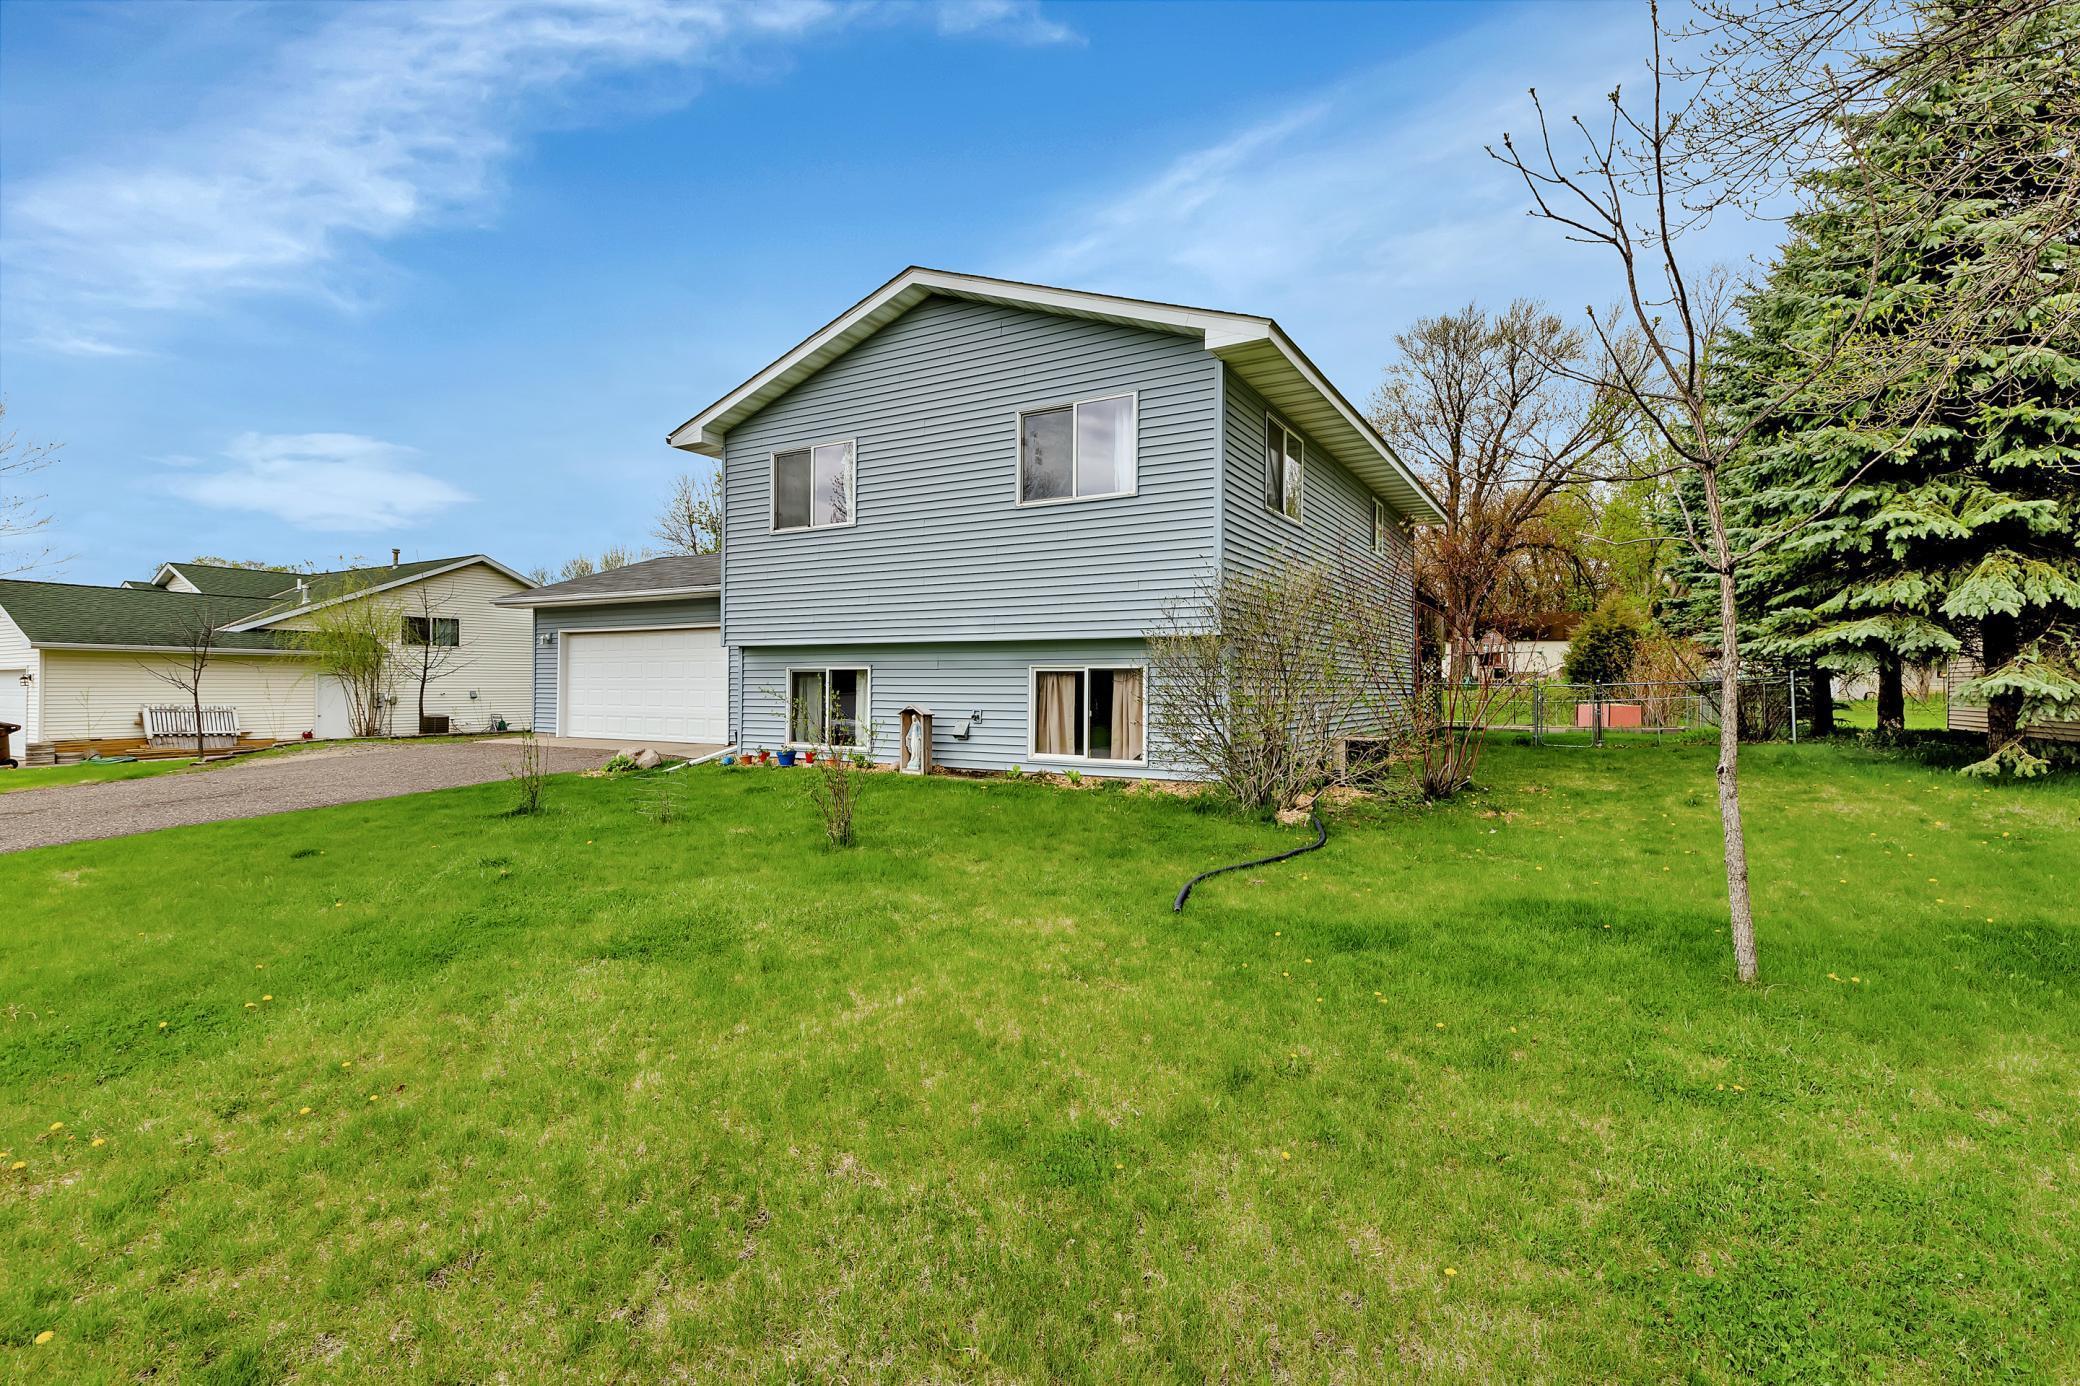 705 Haywood Drive, Howard Lake MN 55349 - Photo 2